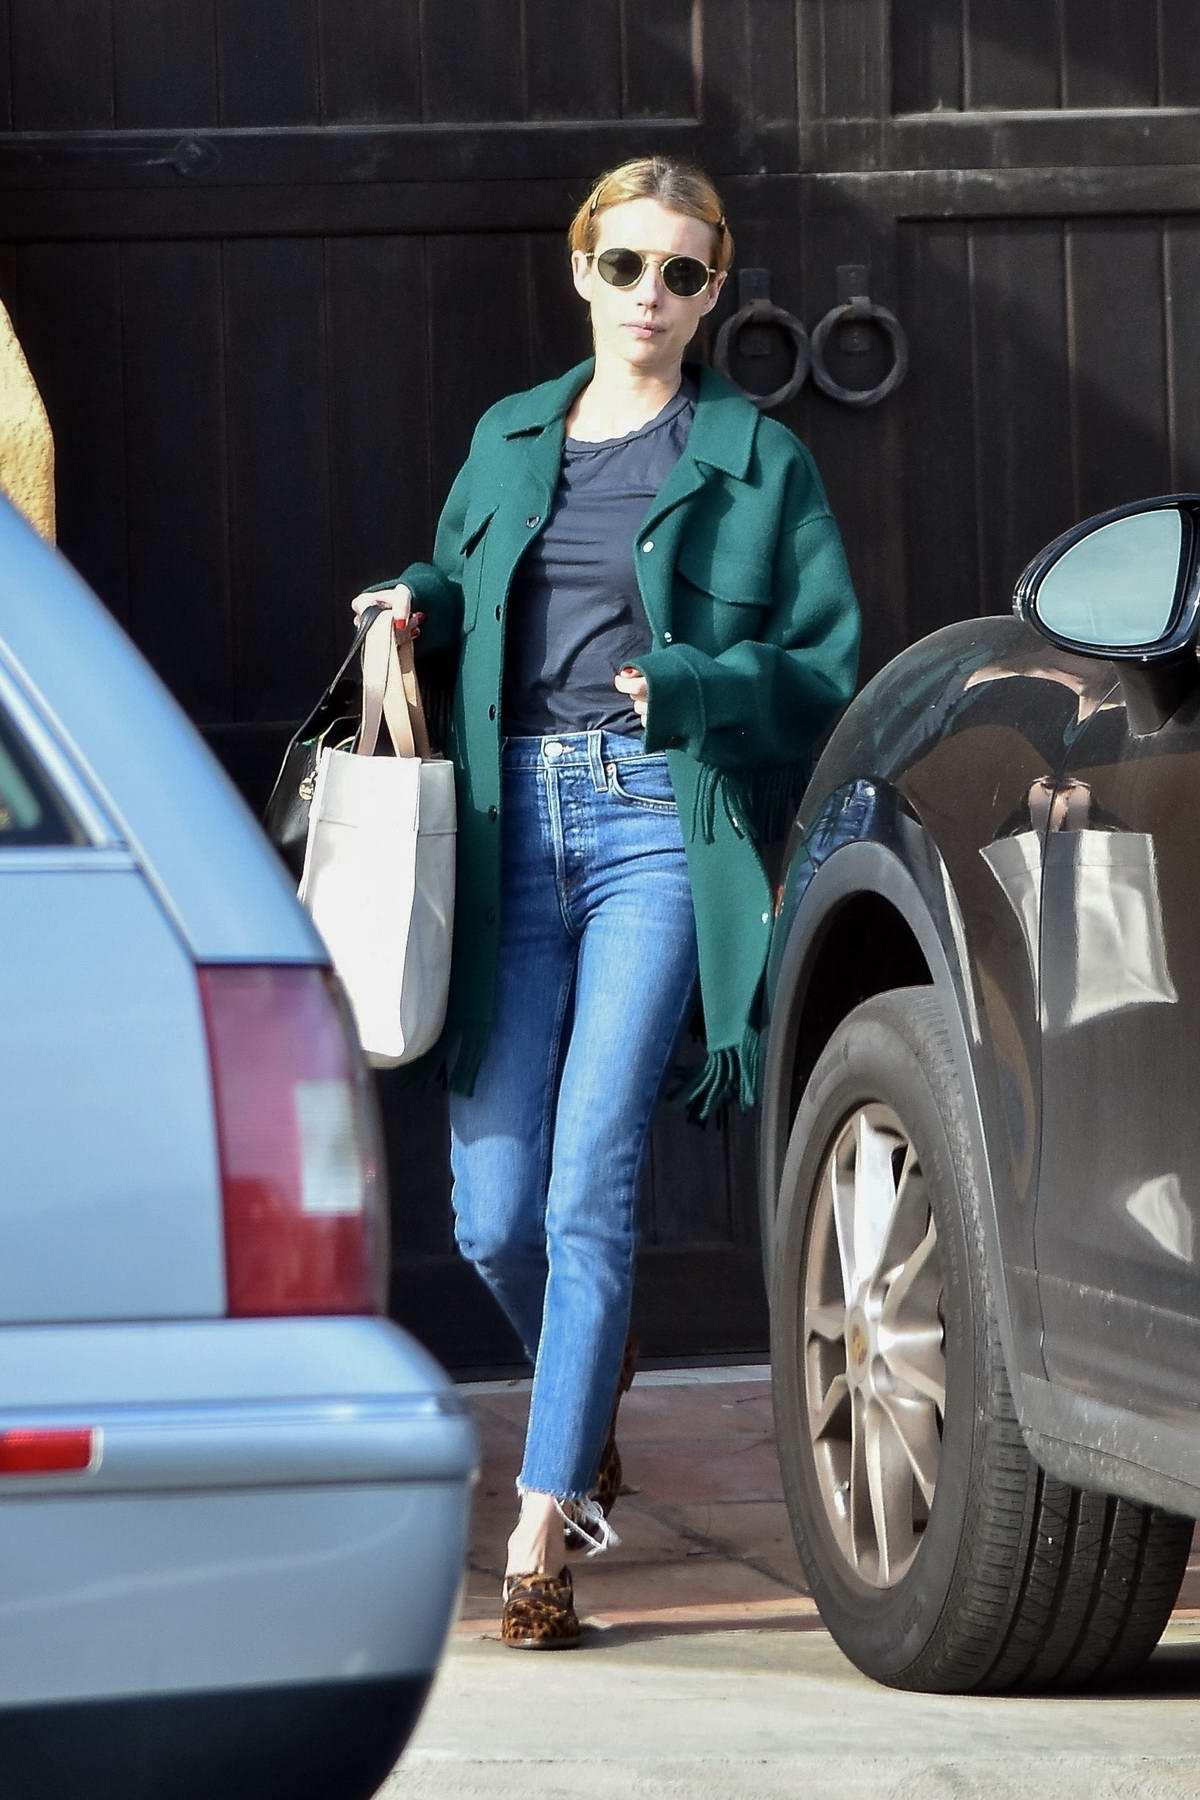 Emma Roberts seen leaving Garrett Hendlund's house in Los Feliz, California